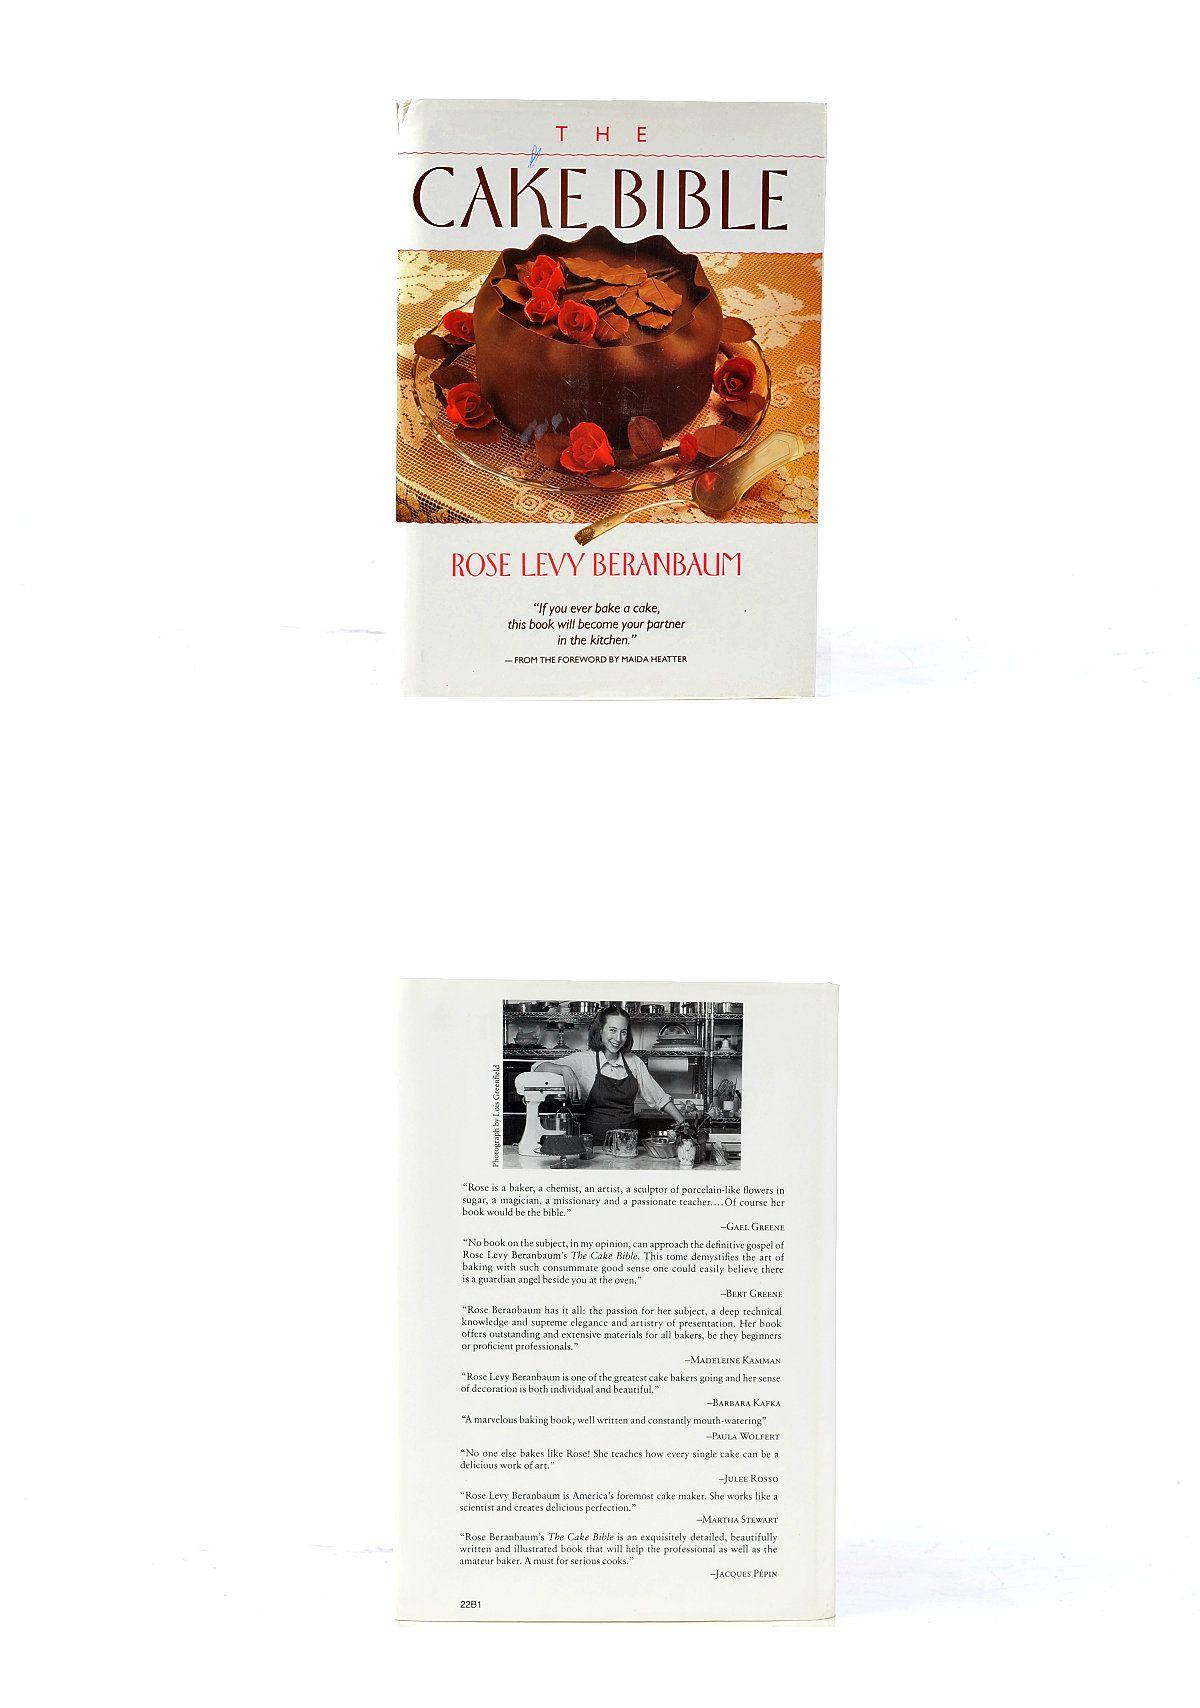 Cookbook 1988 cake bible rose levy beranbaum dessert cook